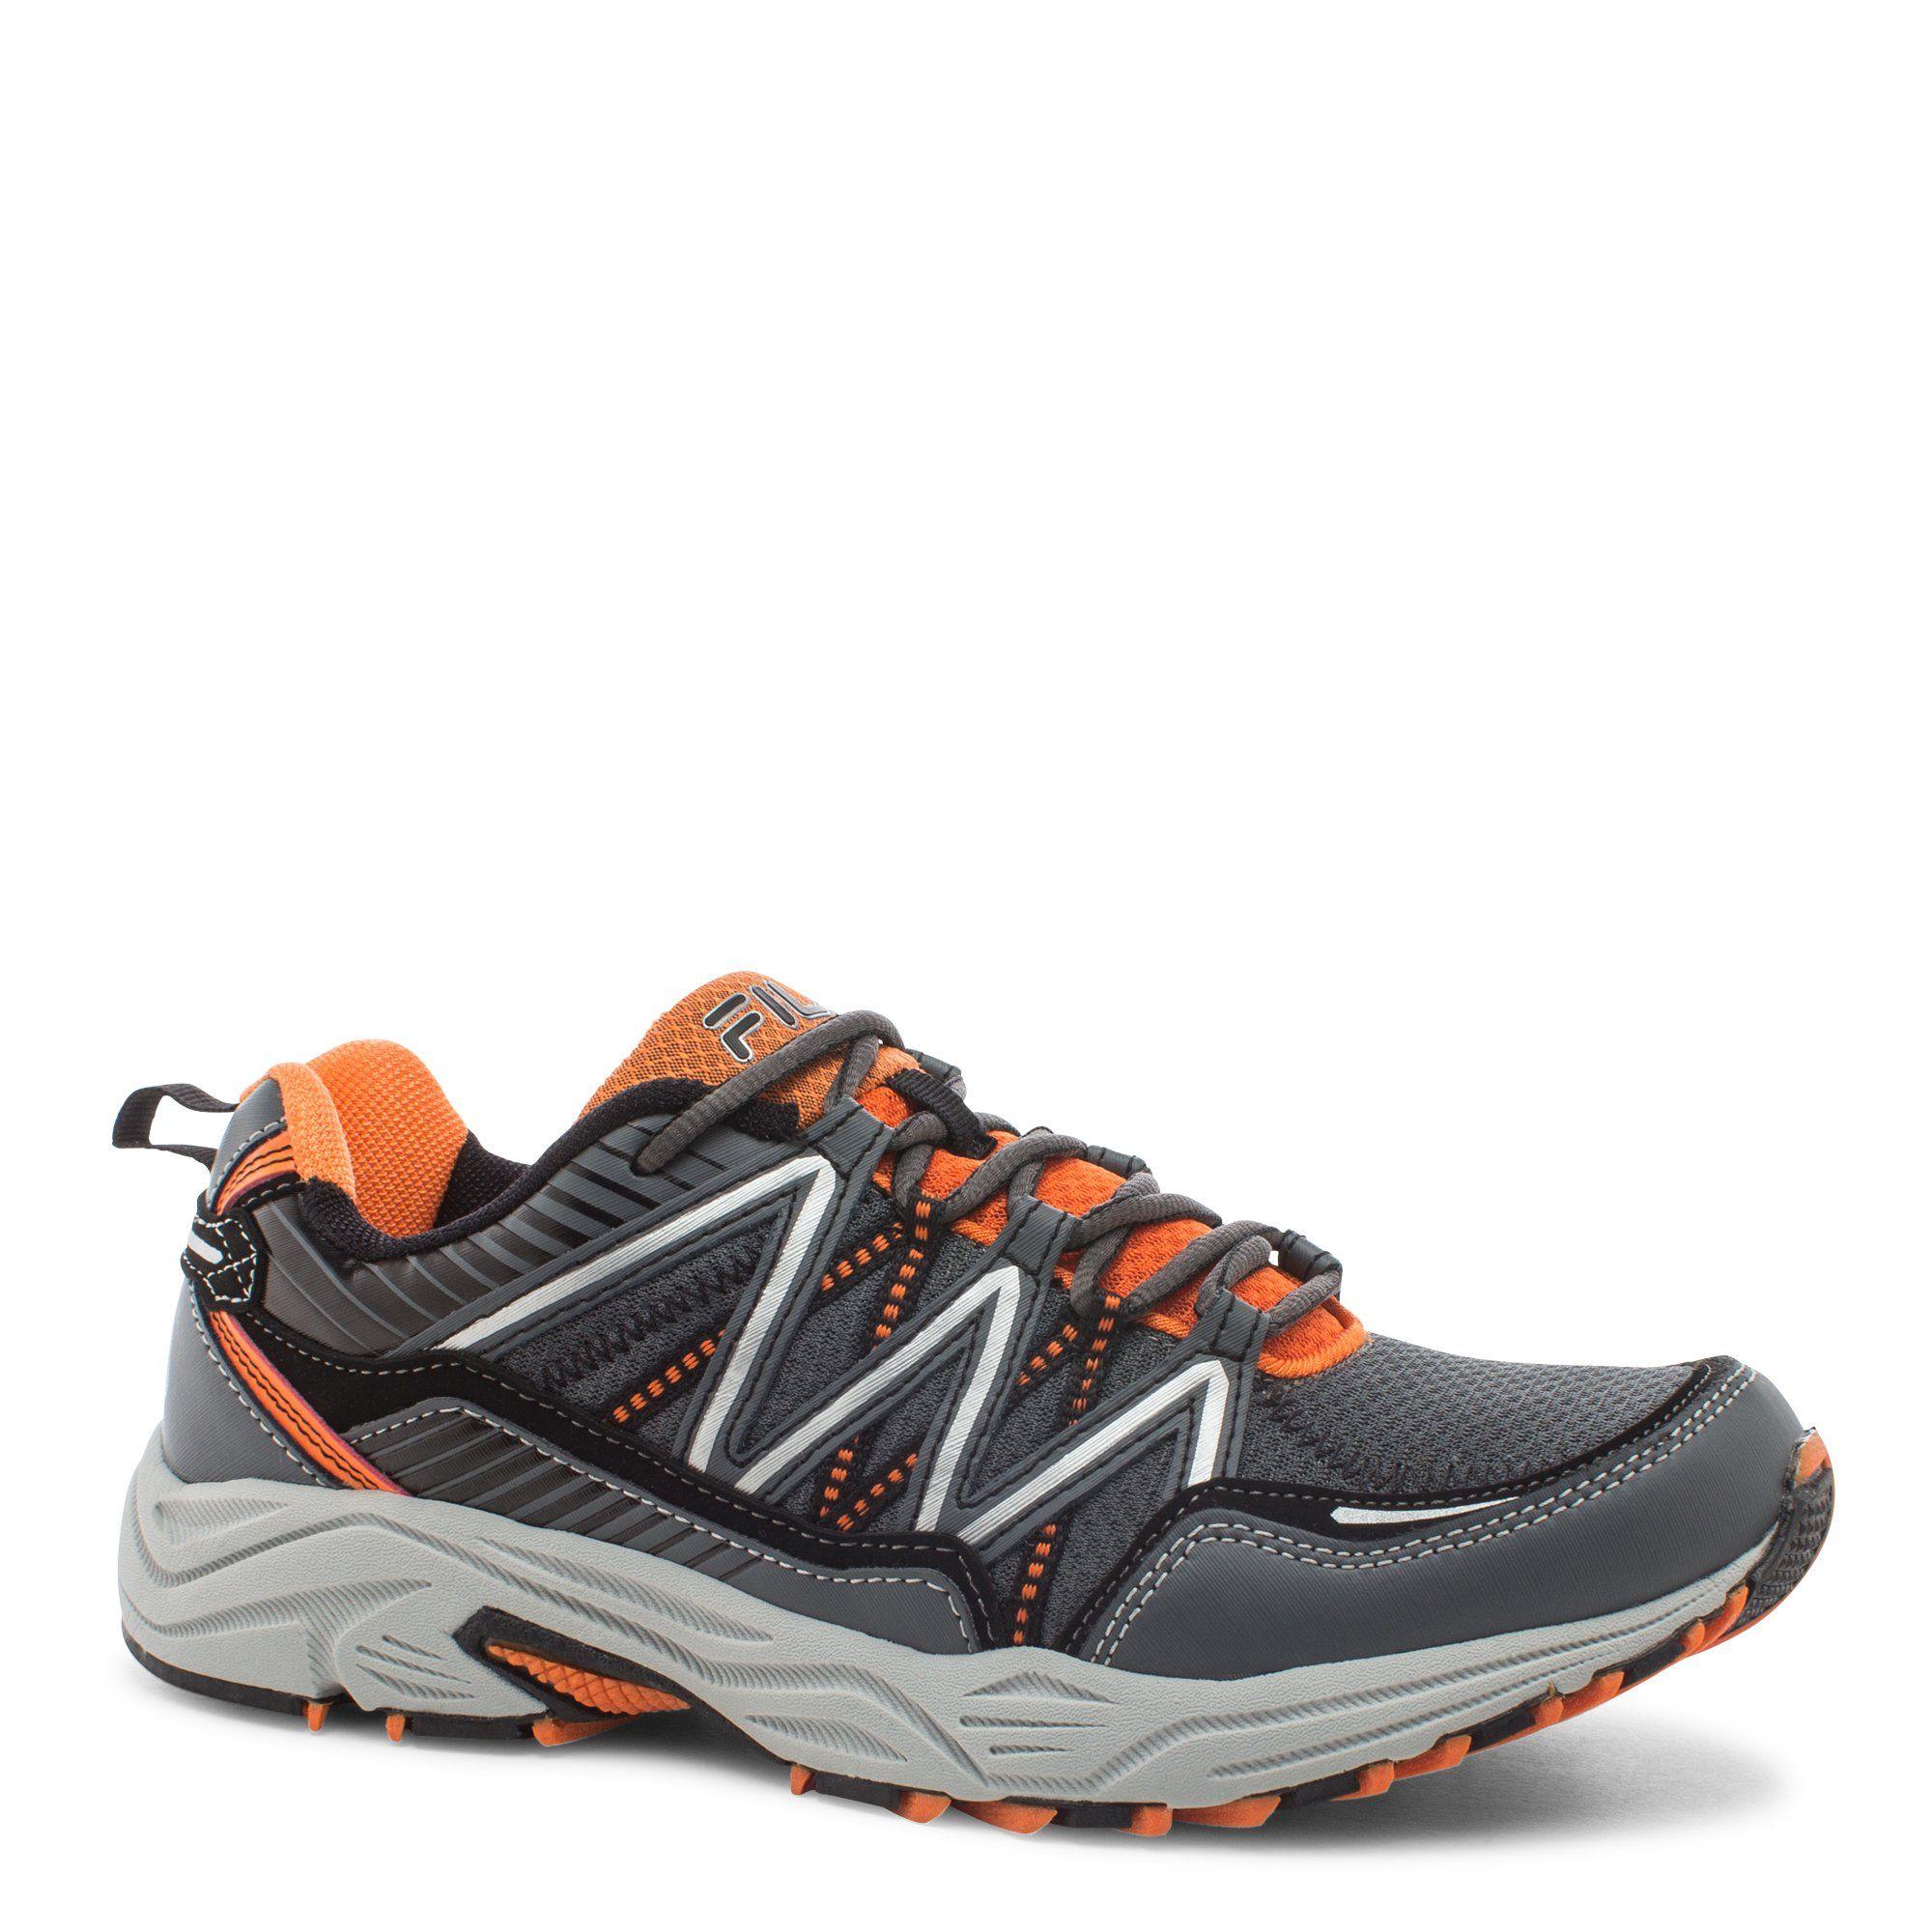 7b5ac4cdfecc Fila Men s Headway 6 Running Shoe